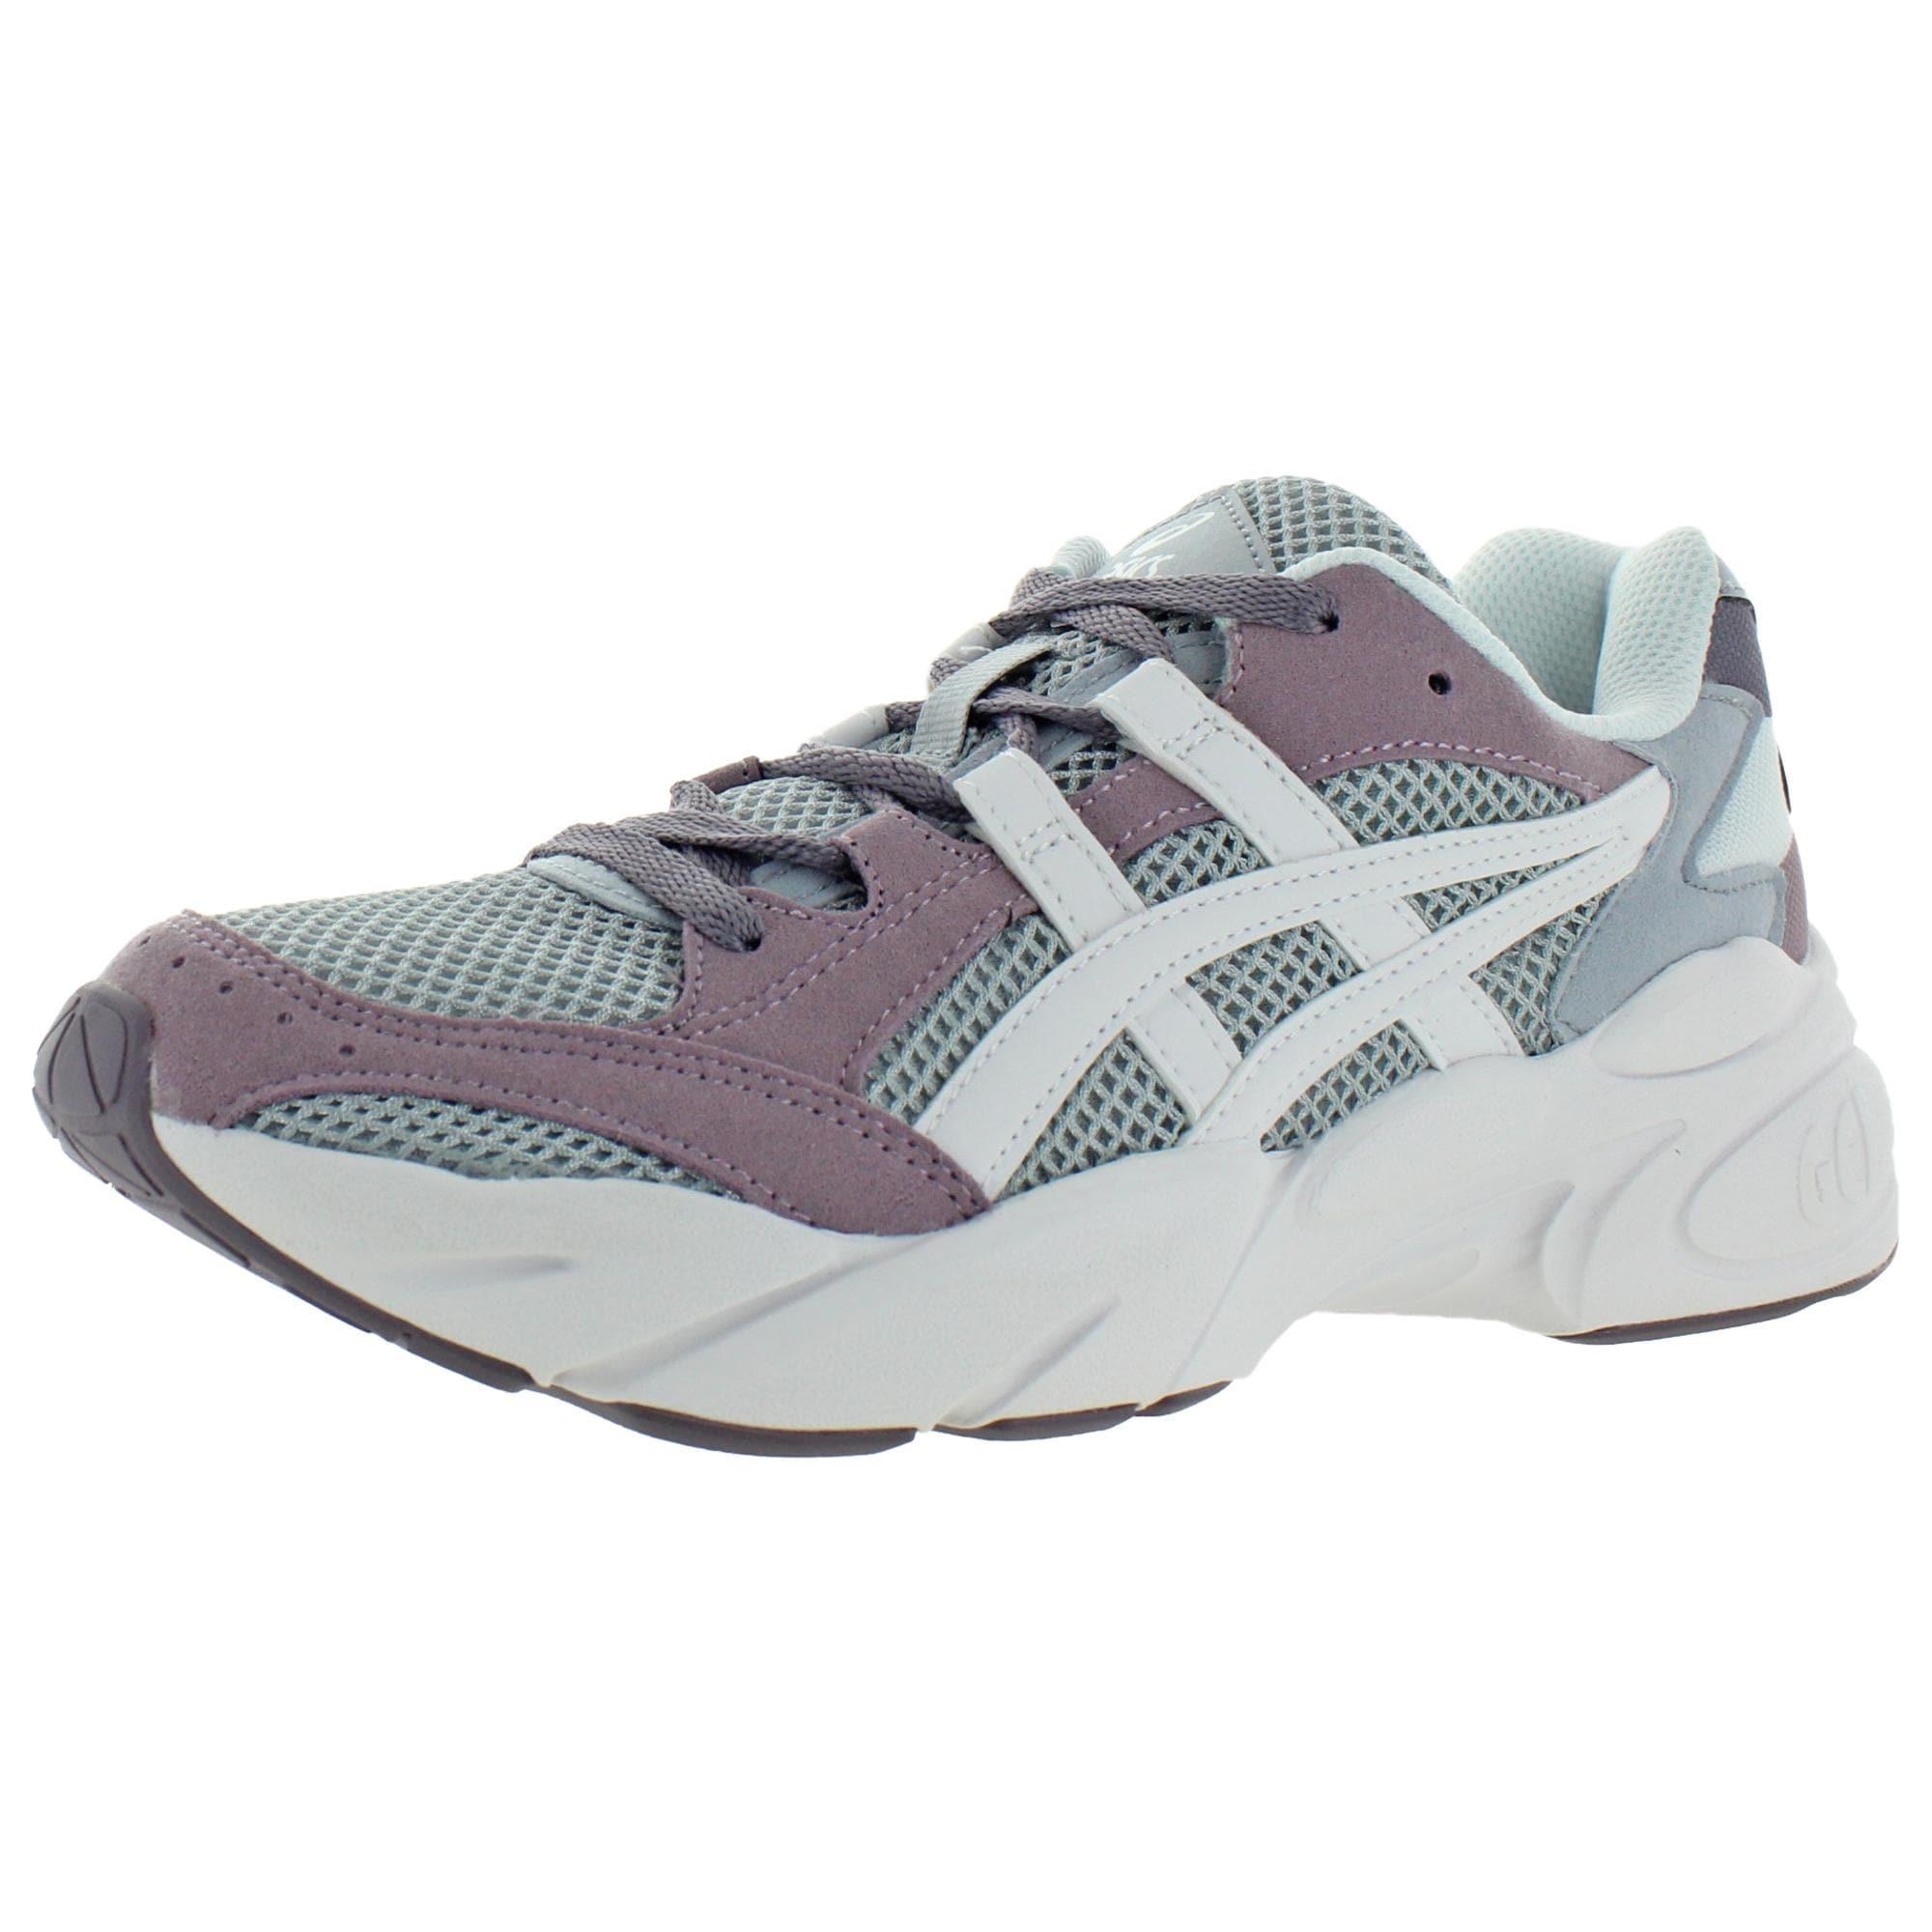 Asics Womens Gel Bnd Athletic Shoes Running Sport Piedmont Grey Violet Blush Overstock 30801436